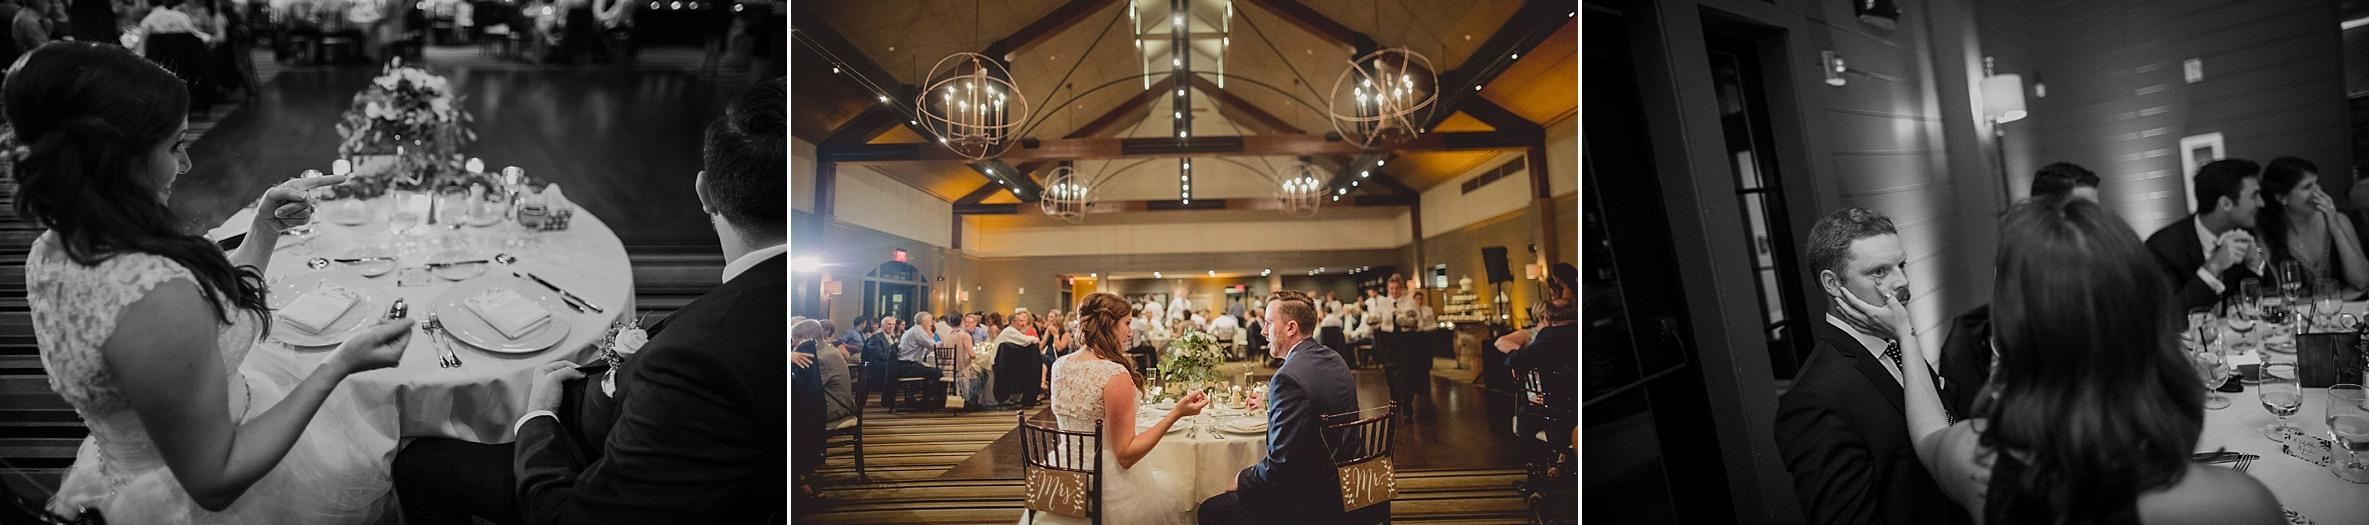 labelle winery wedding-106.jpg